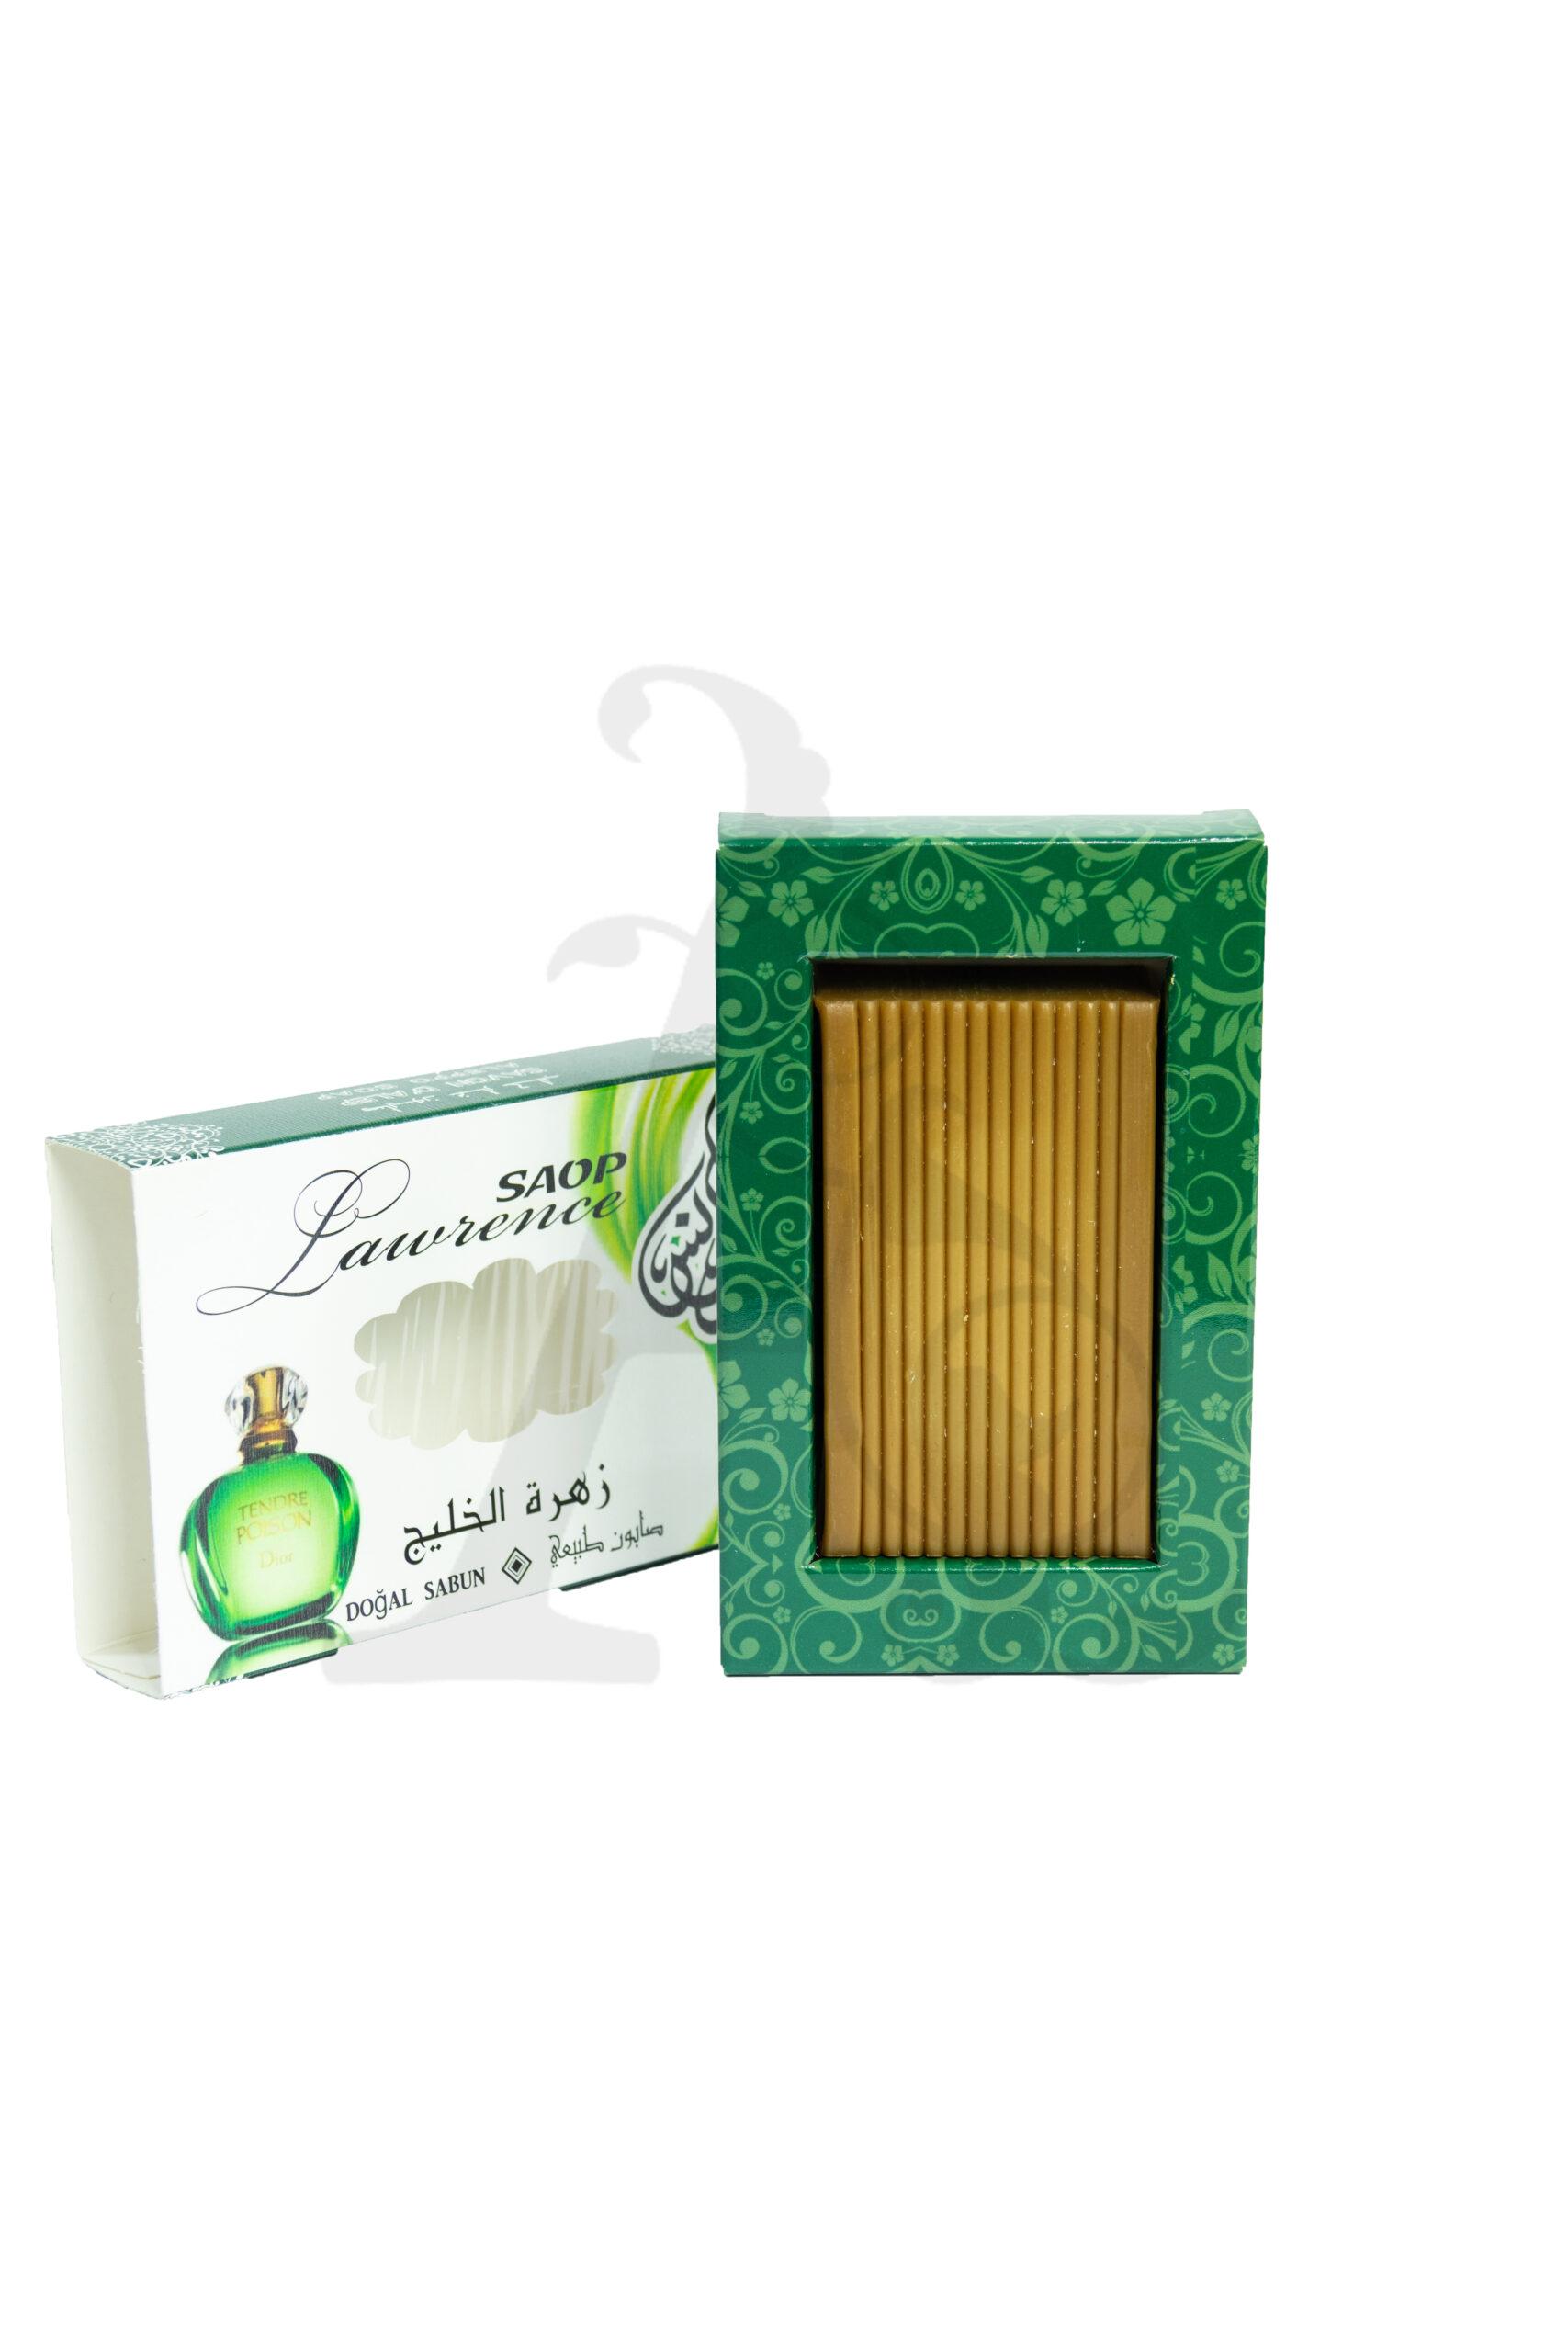 Buy Lawrence Natural Soap - Flower of Khalij - Dark Green